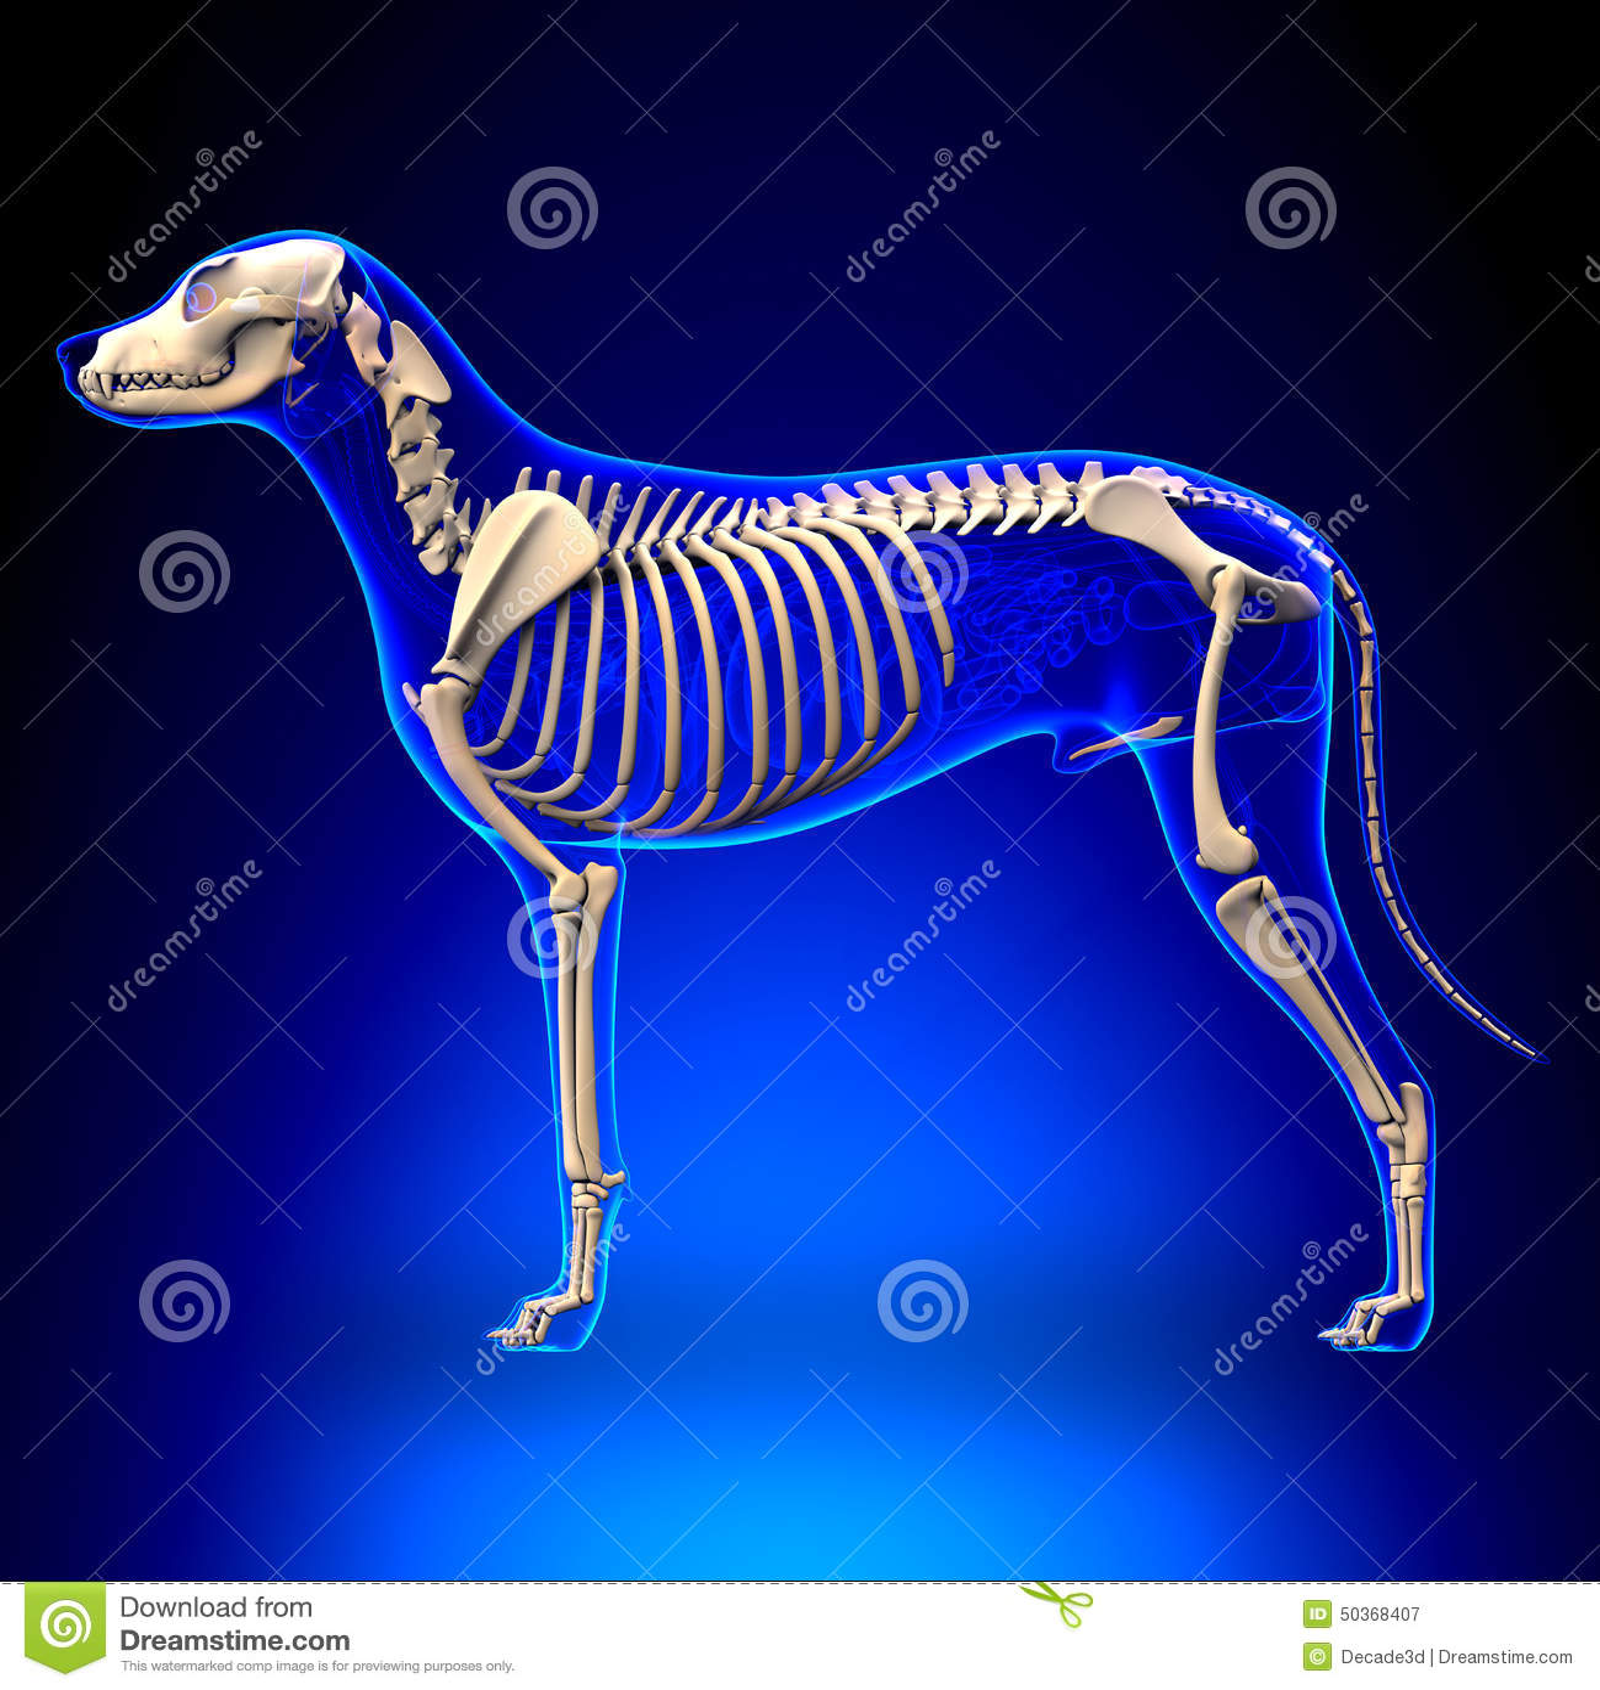 Dog Skeleton - Canis Lupus Familiaris Anatomy - Side View Stock ...